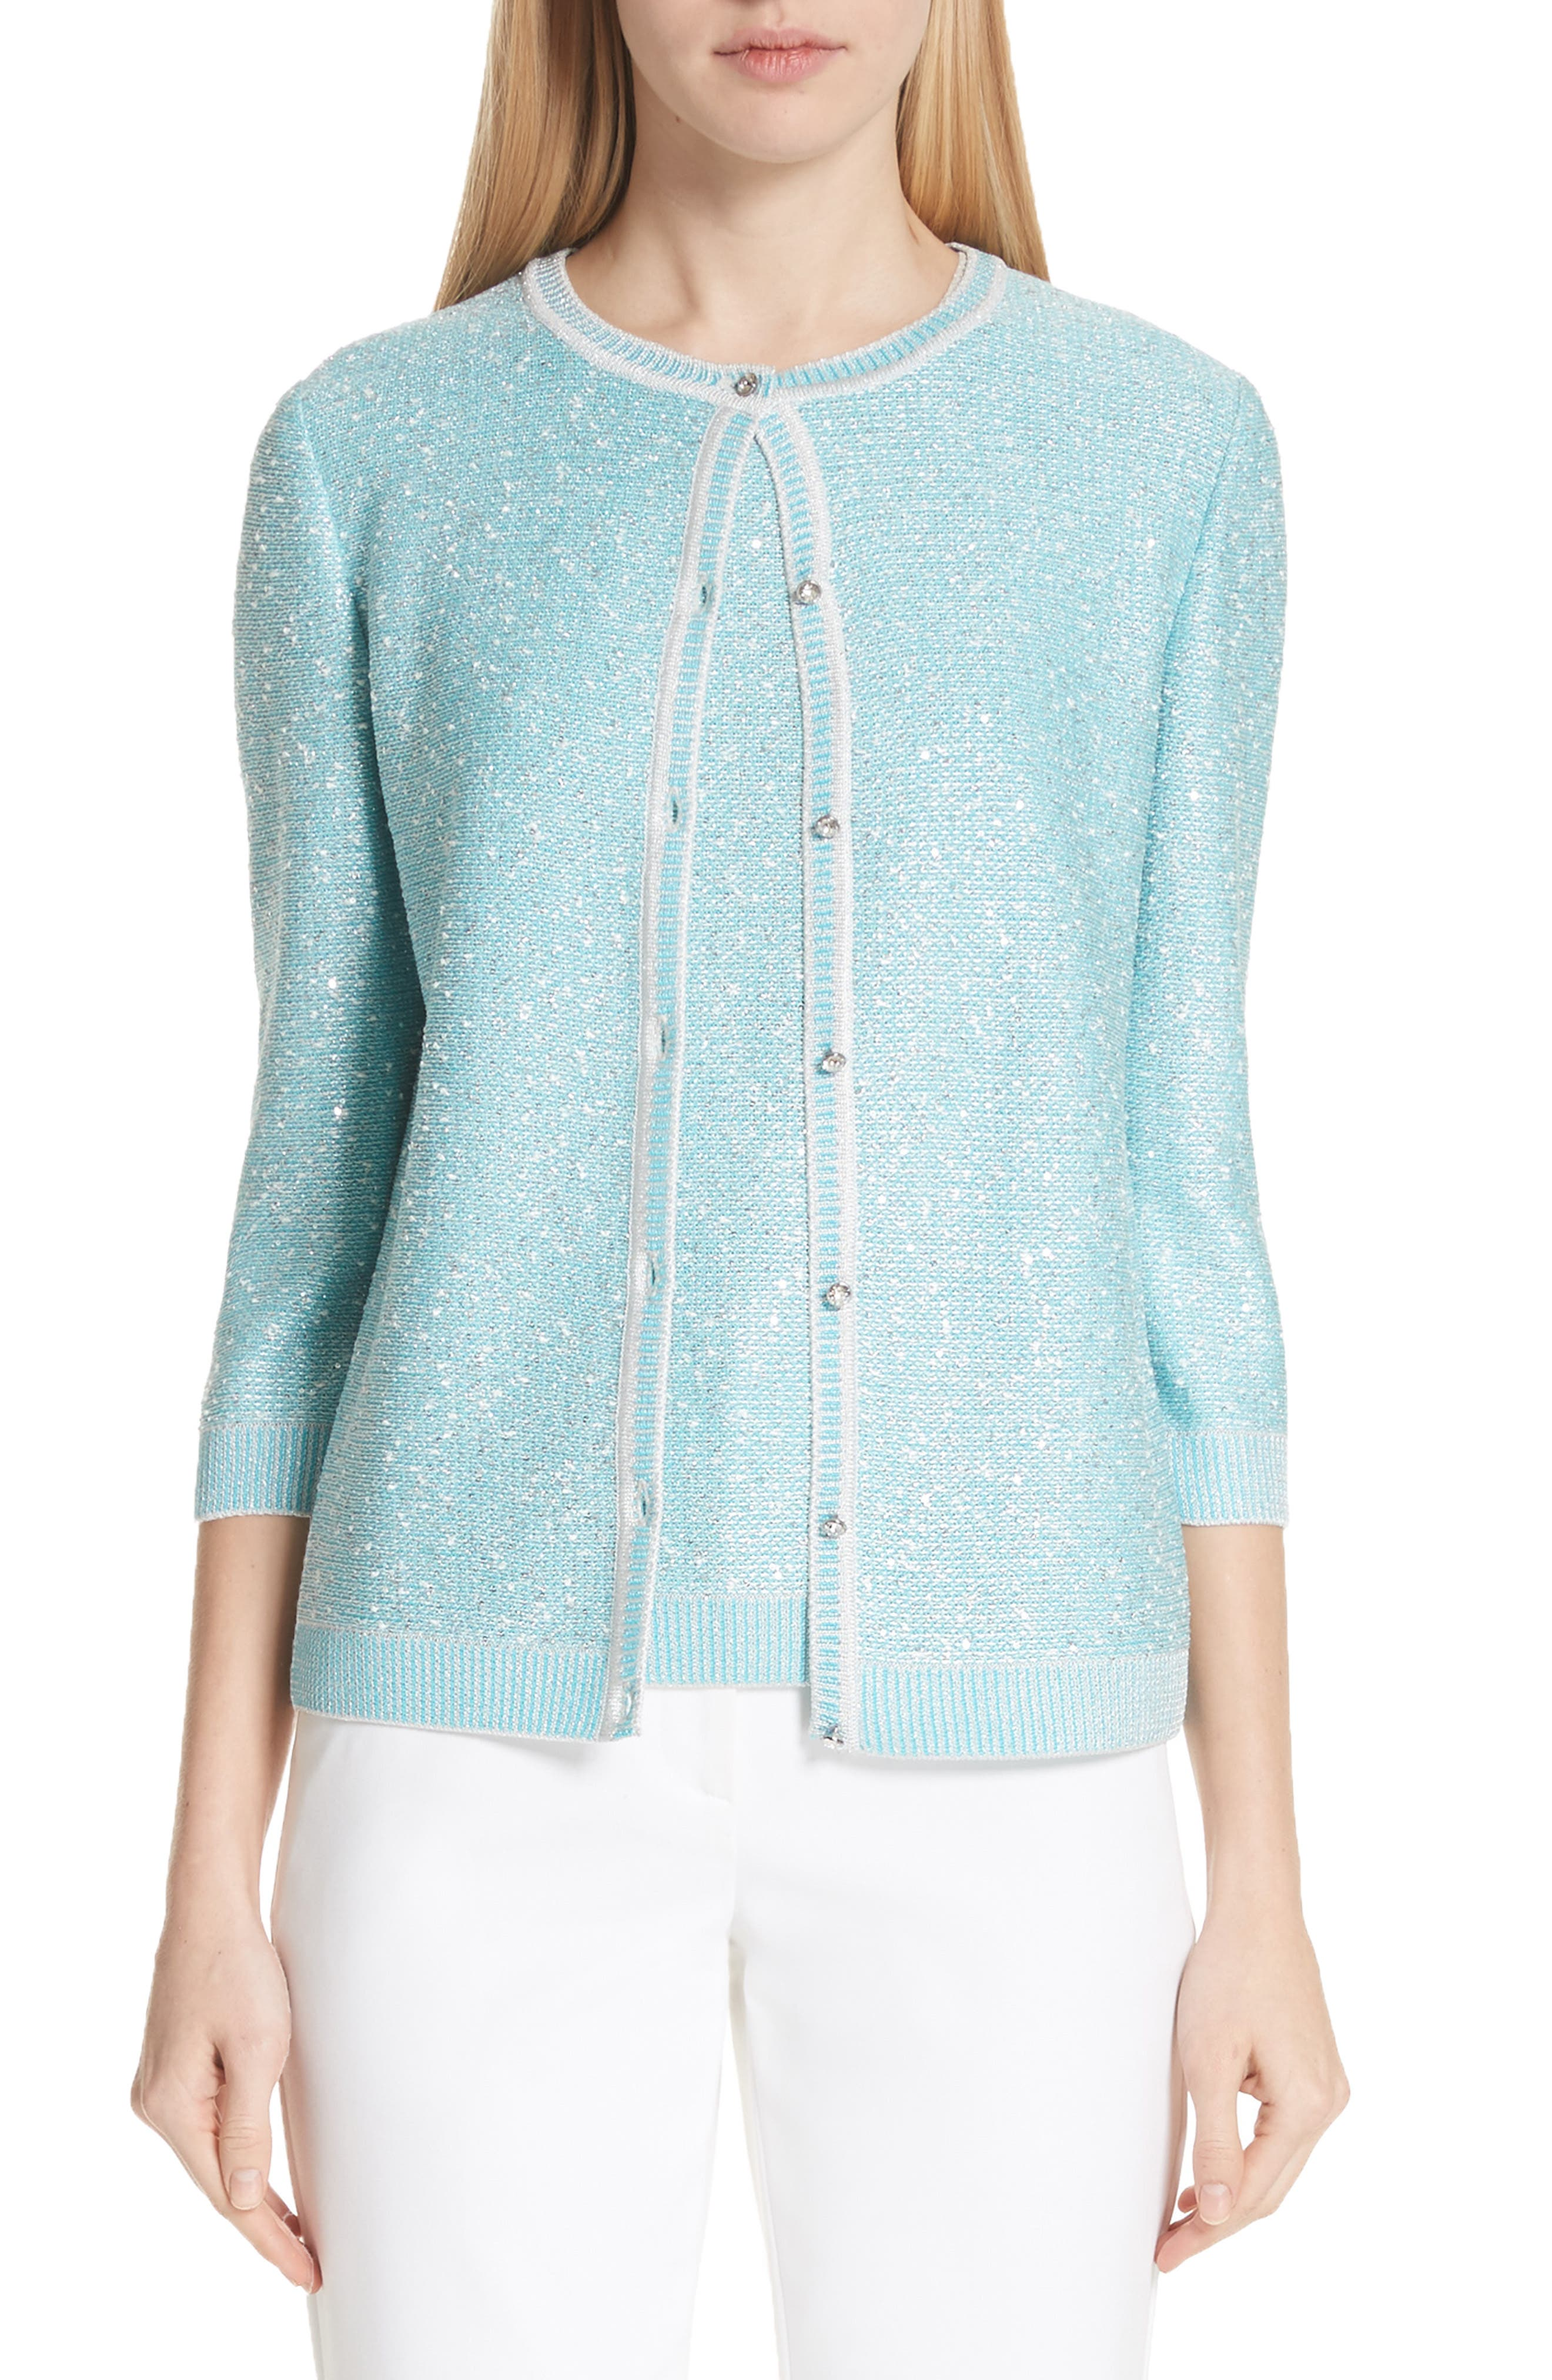 St. John Collection Flecked Sparkle Knit Cardigan